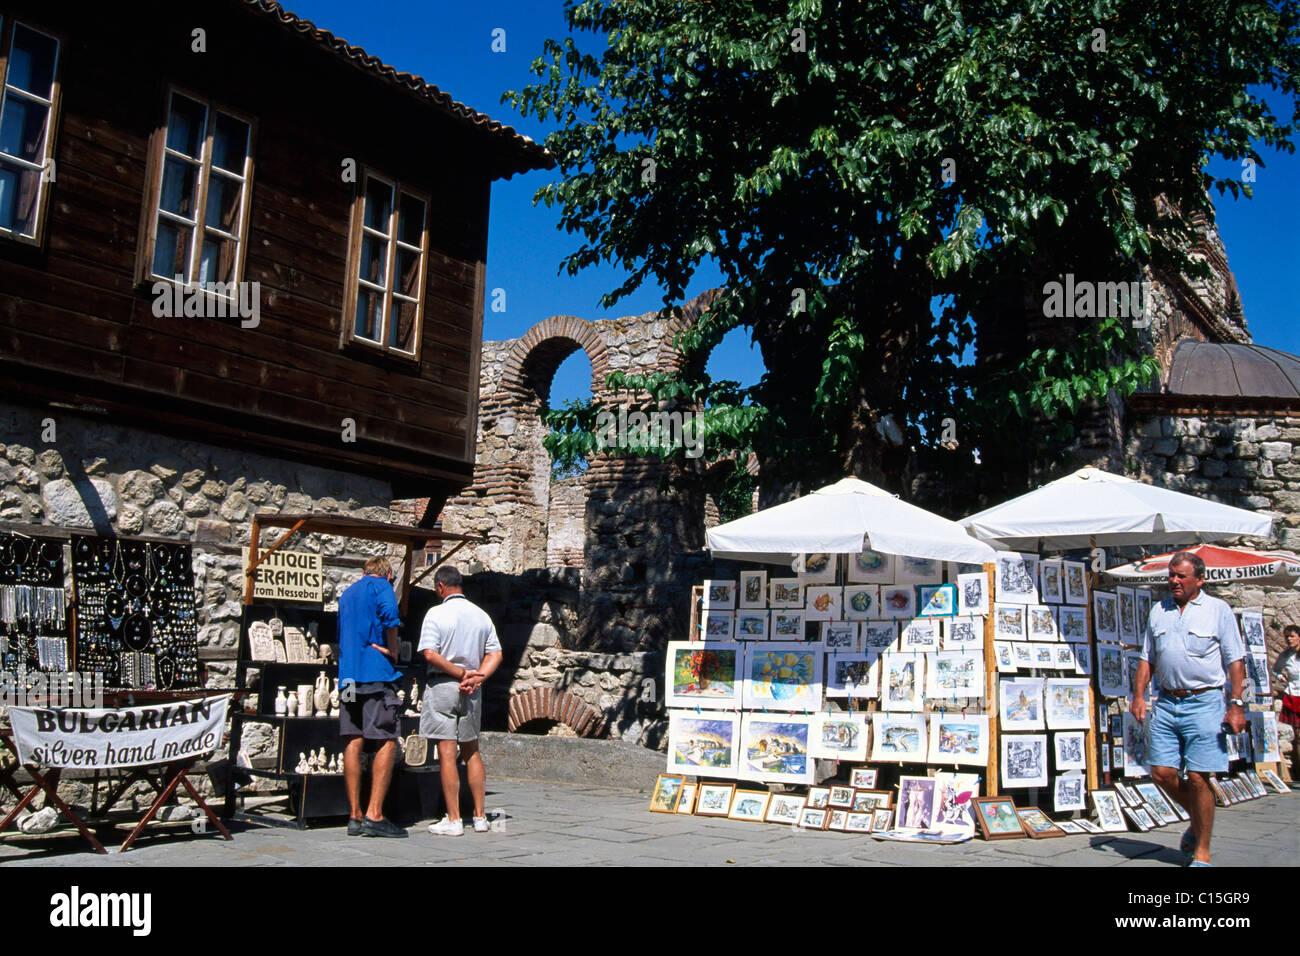 Sales booths, vendors, Nessebar, Black Sea, Bulgaria, Southeastern Europe - Stock Image